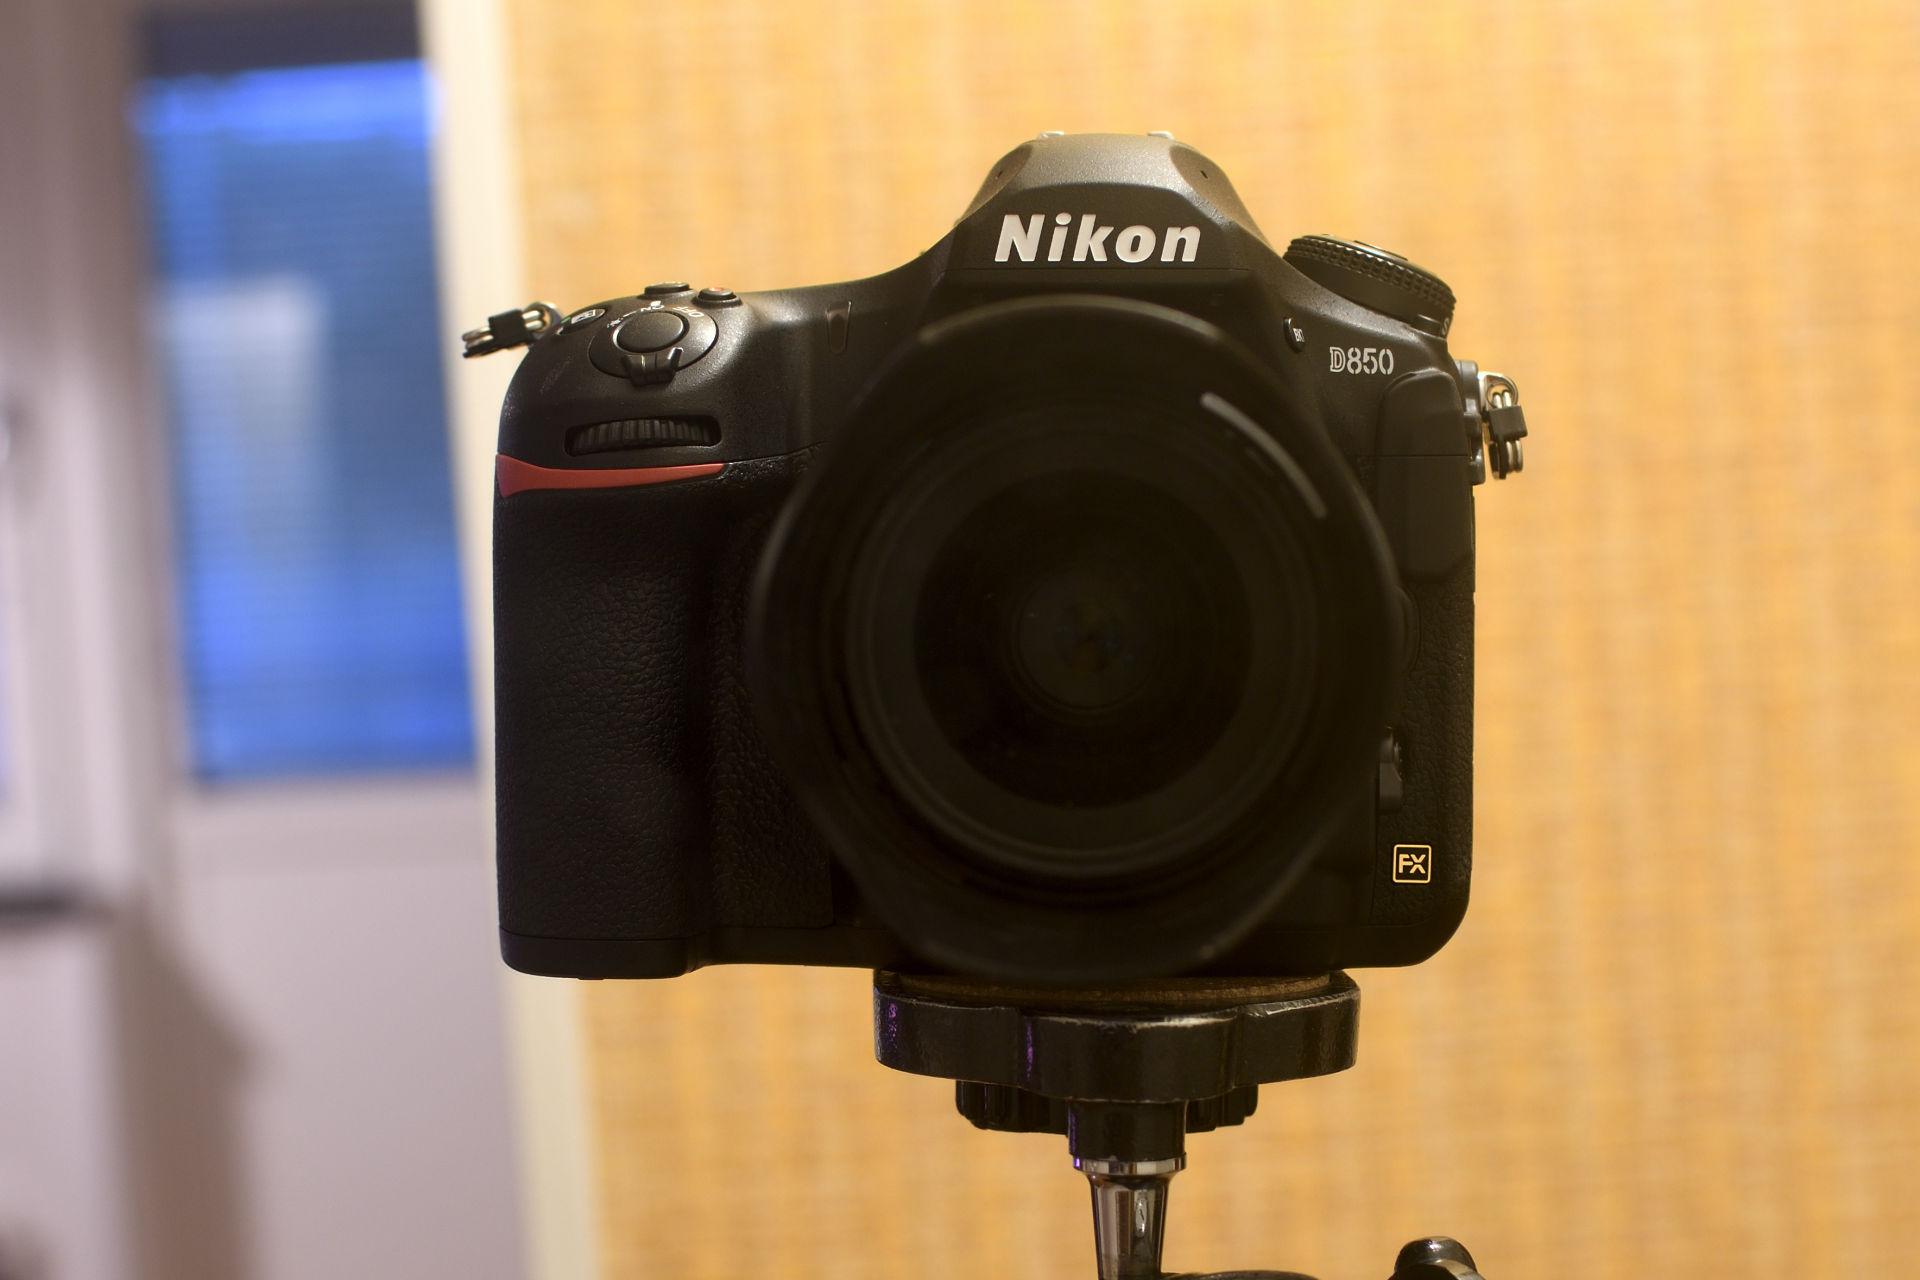 2017-10-25 Nikon D850 by Magnus Norden